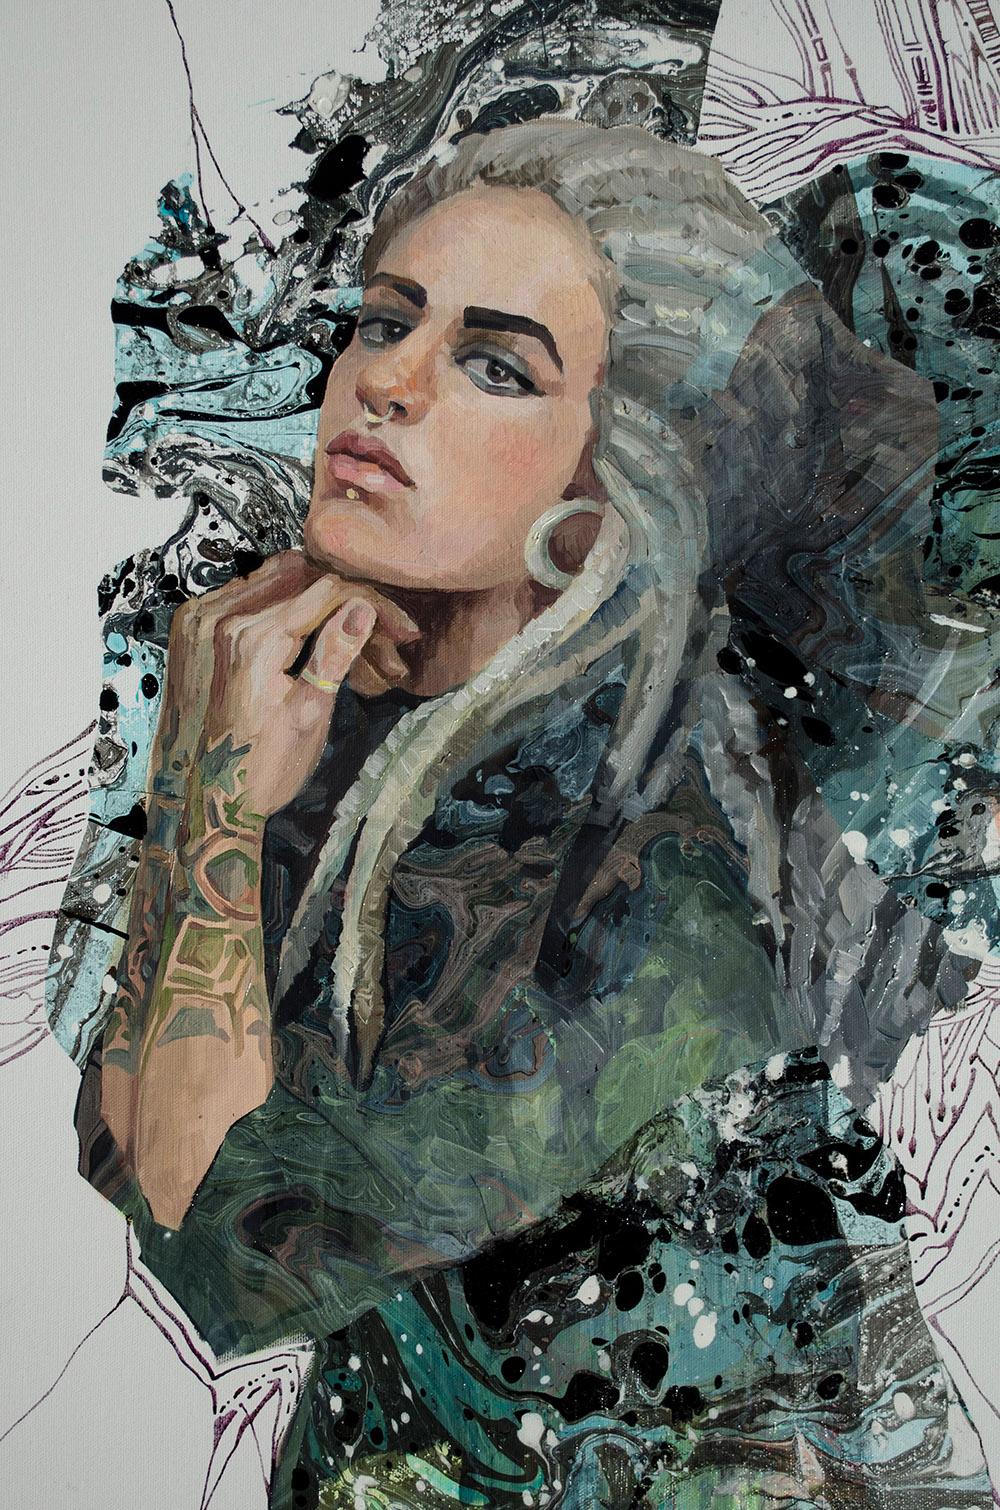 Kate_Goltseva_Woman_with_dreadlocks_oil_on_canvas_18x24__$1250.jpg